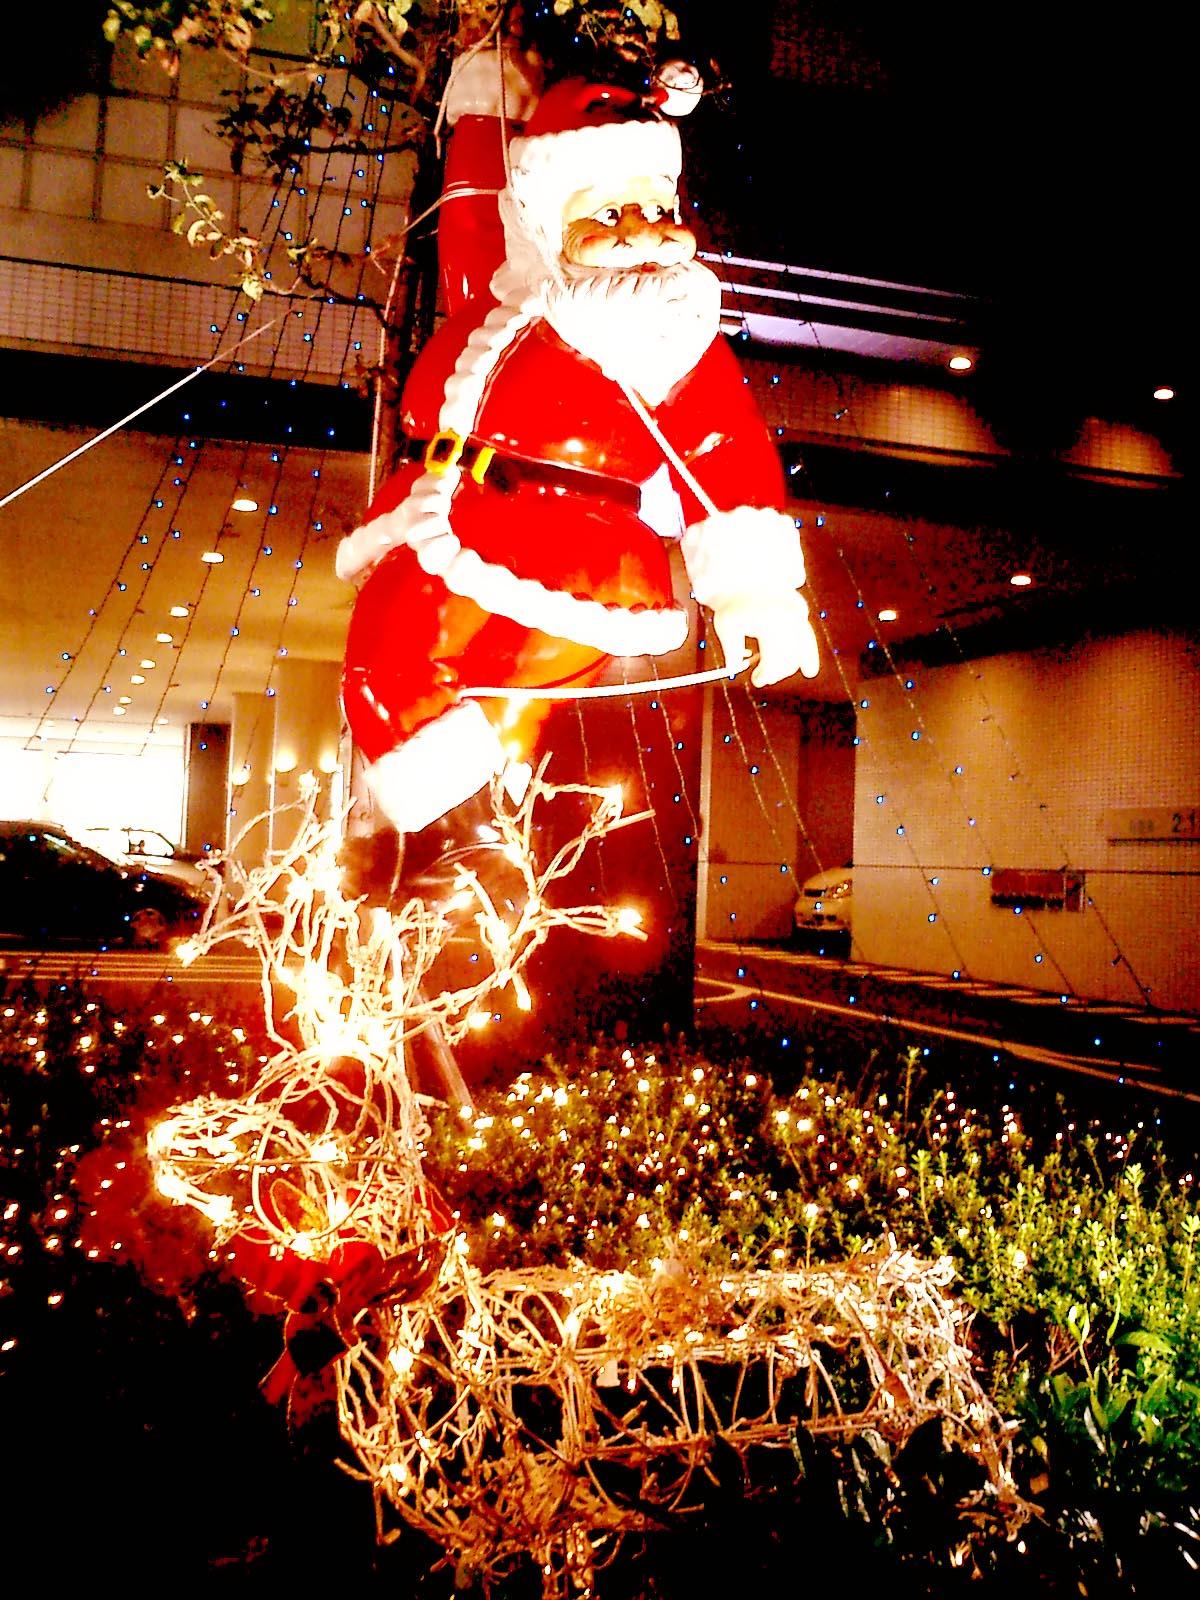 http://upload.wikimedia.org/wikipedia/commons/3/3c/Santa_Claus_kobe.jpg